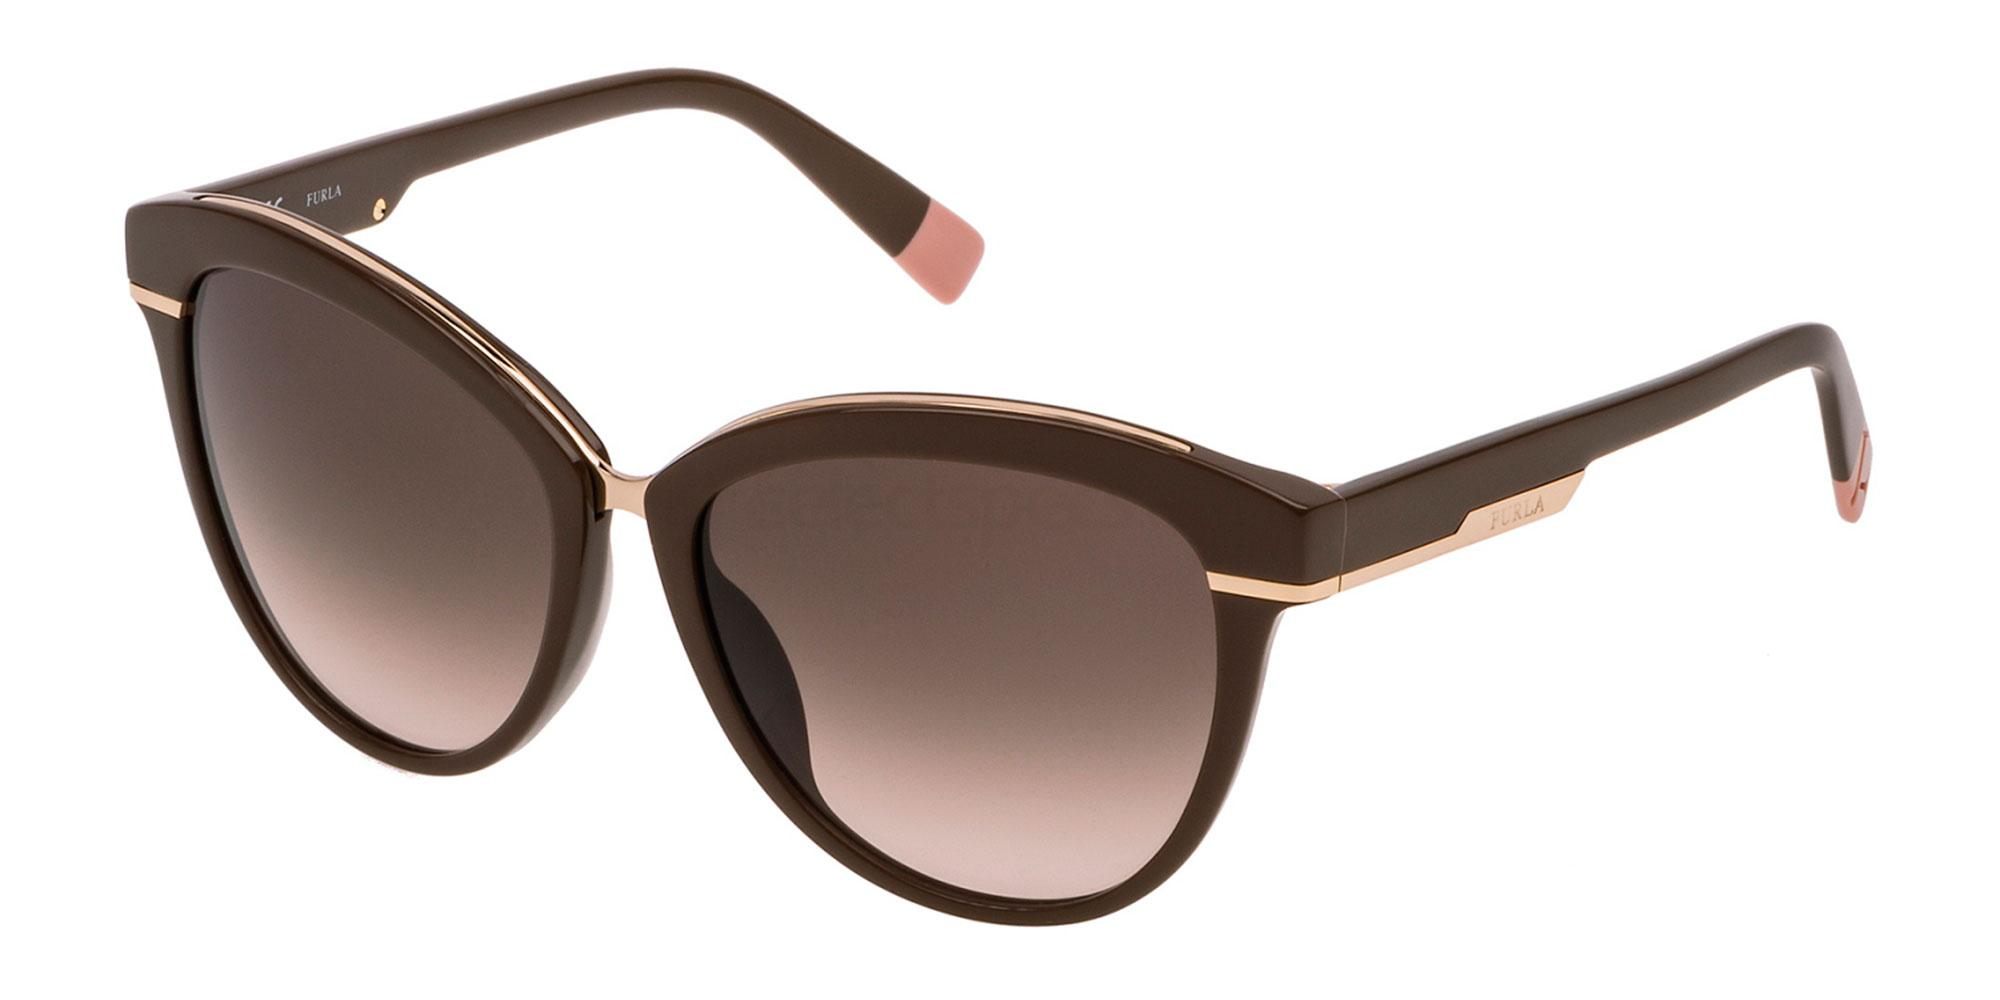 06XK SFU140 Sunglasses, Furla